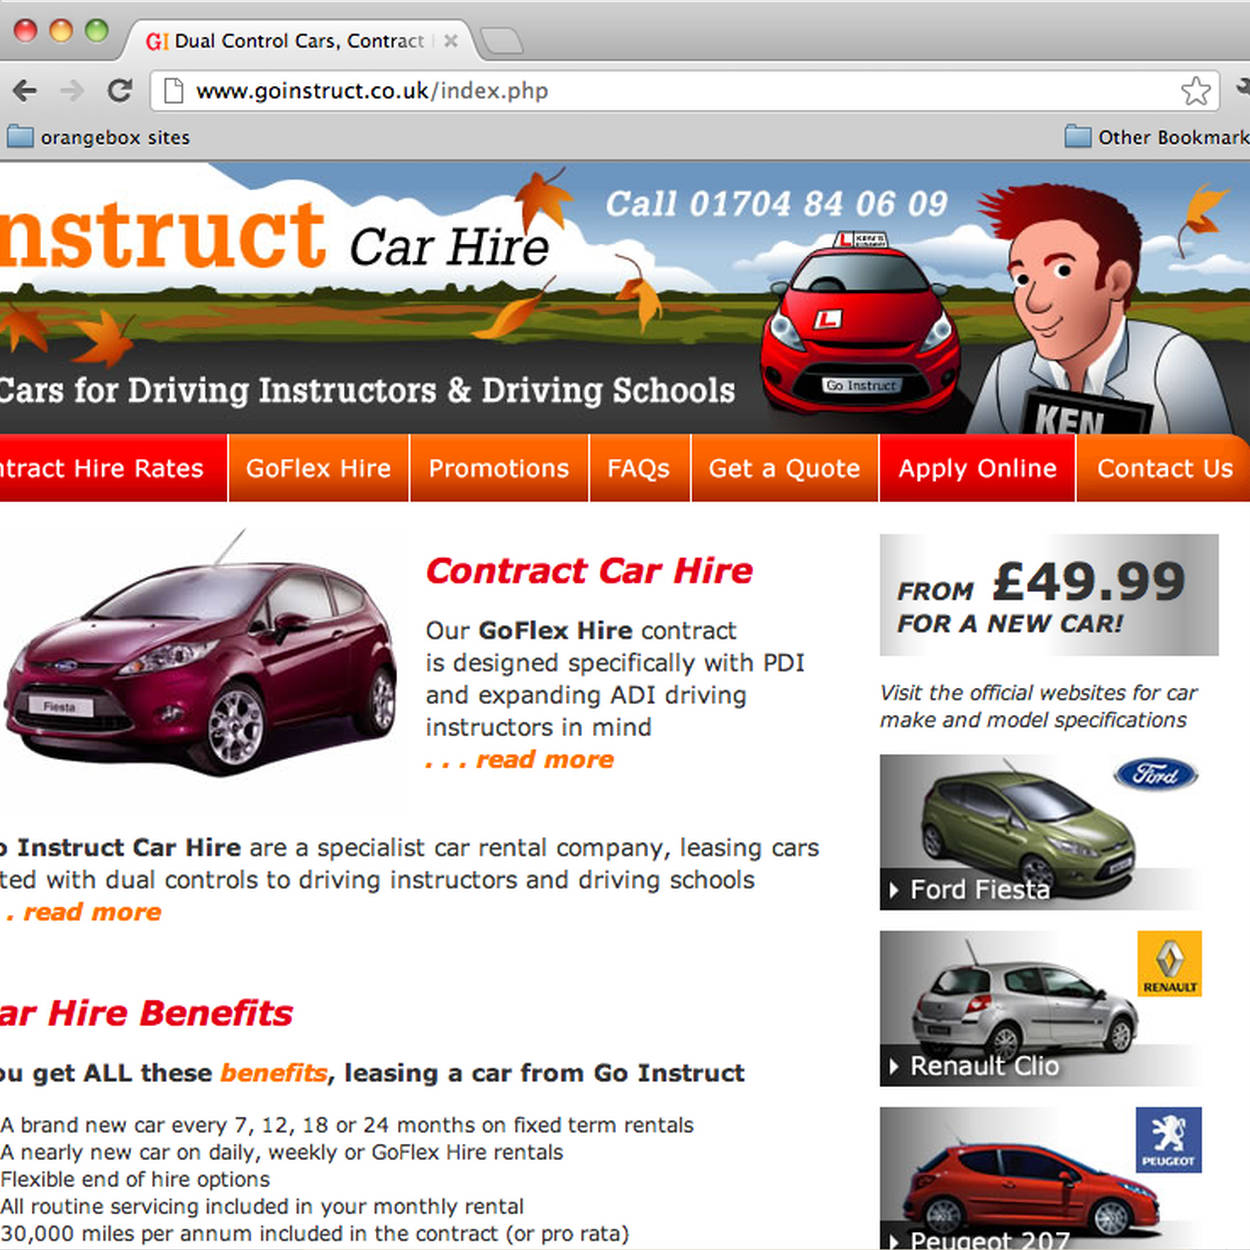 Go Instruct Website, Autumn Banner, Ken character, Orangebox web design